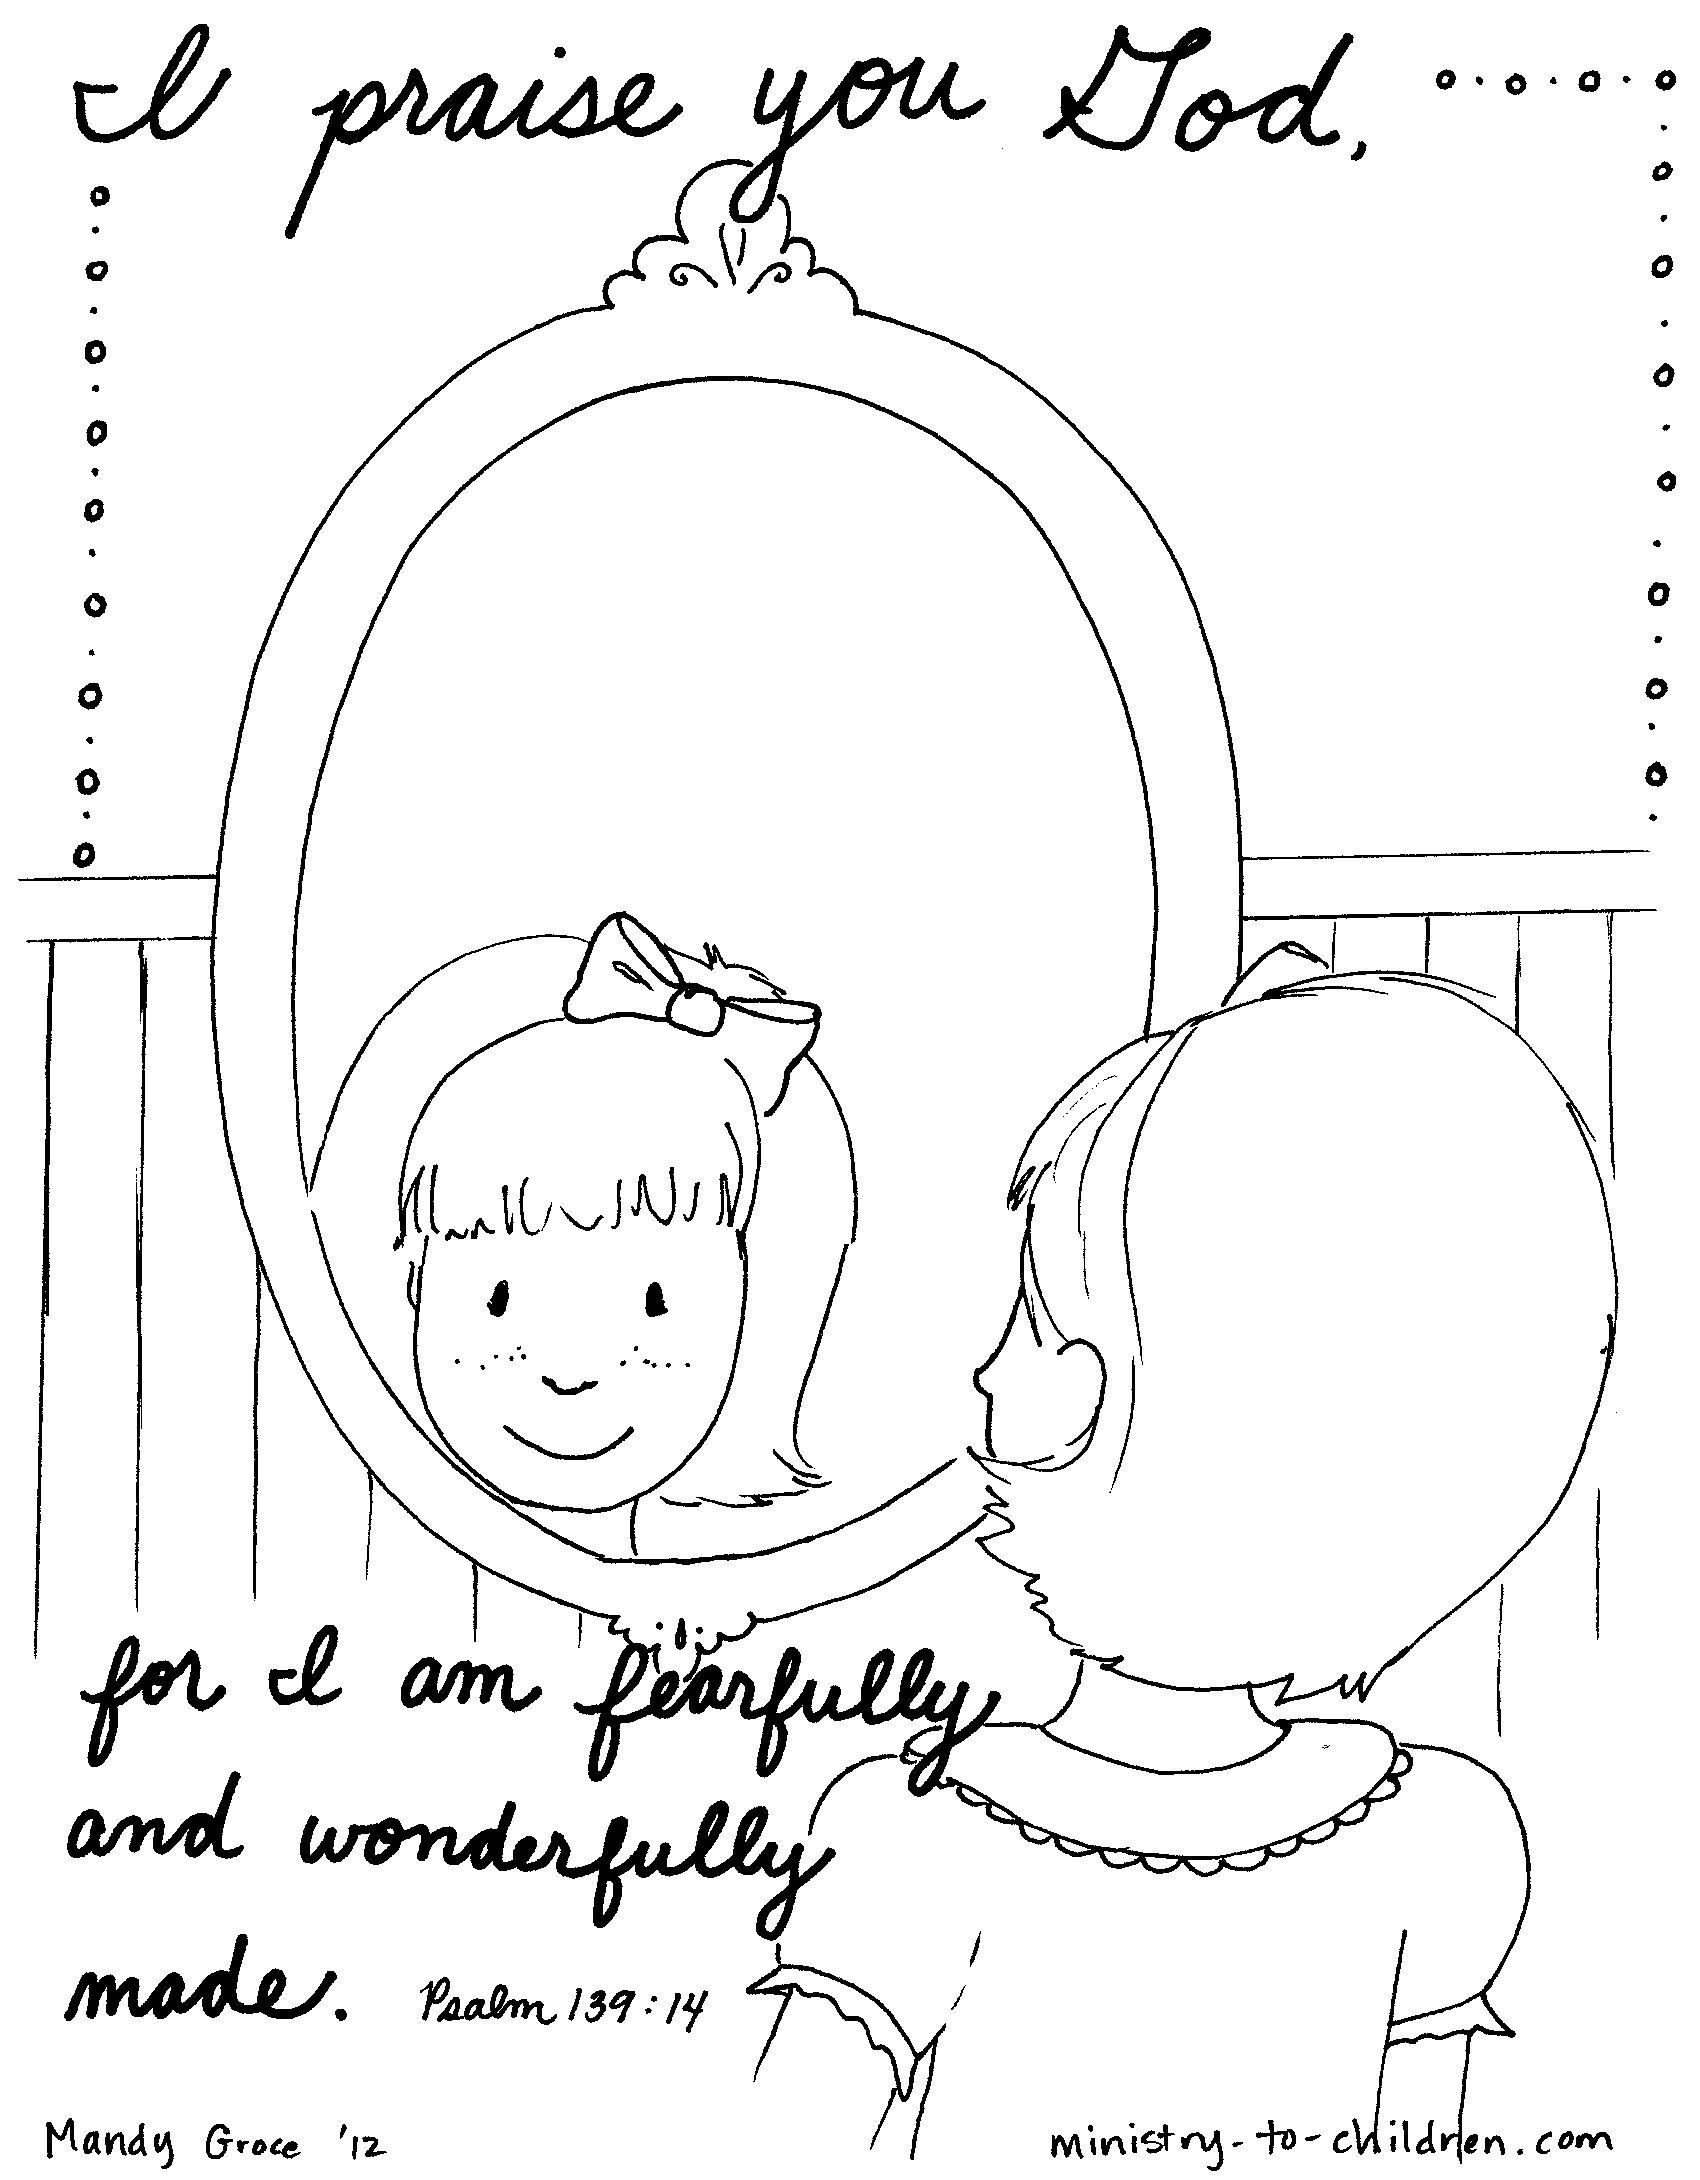 psalm 139 14 coloring pages barat pinterest psalm 139 14